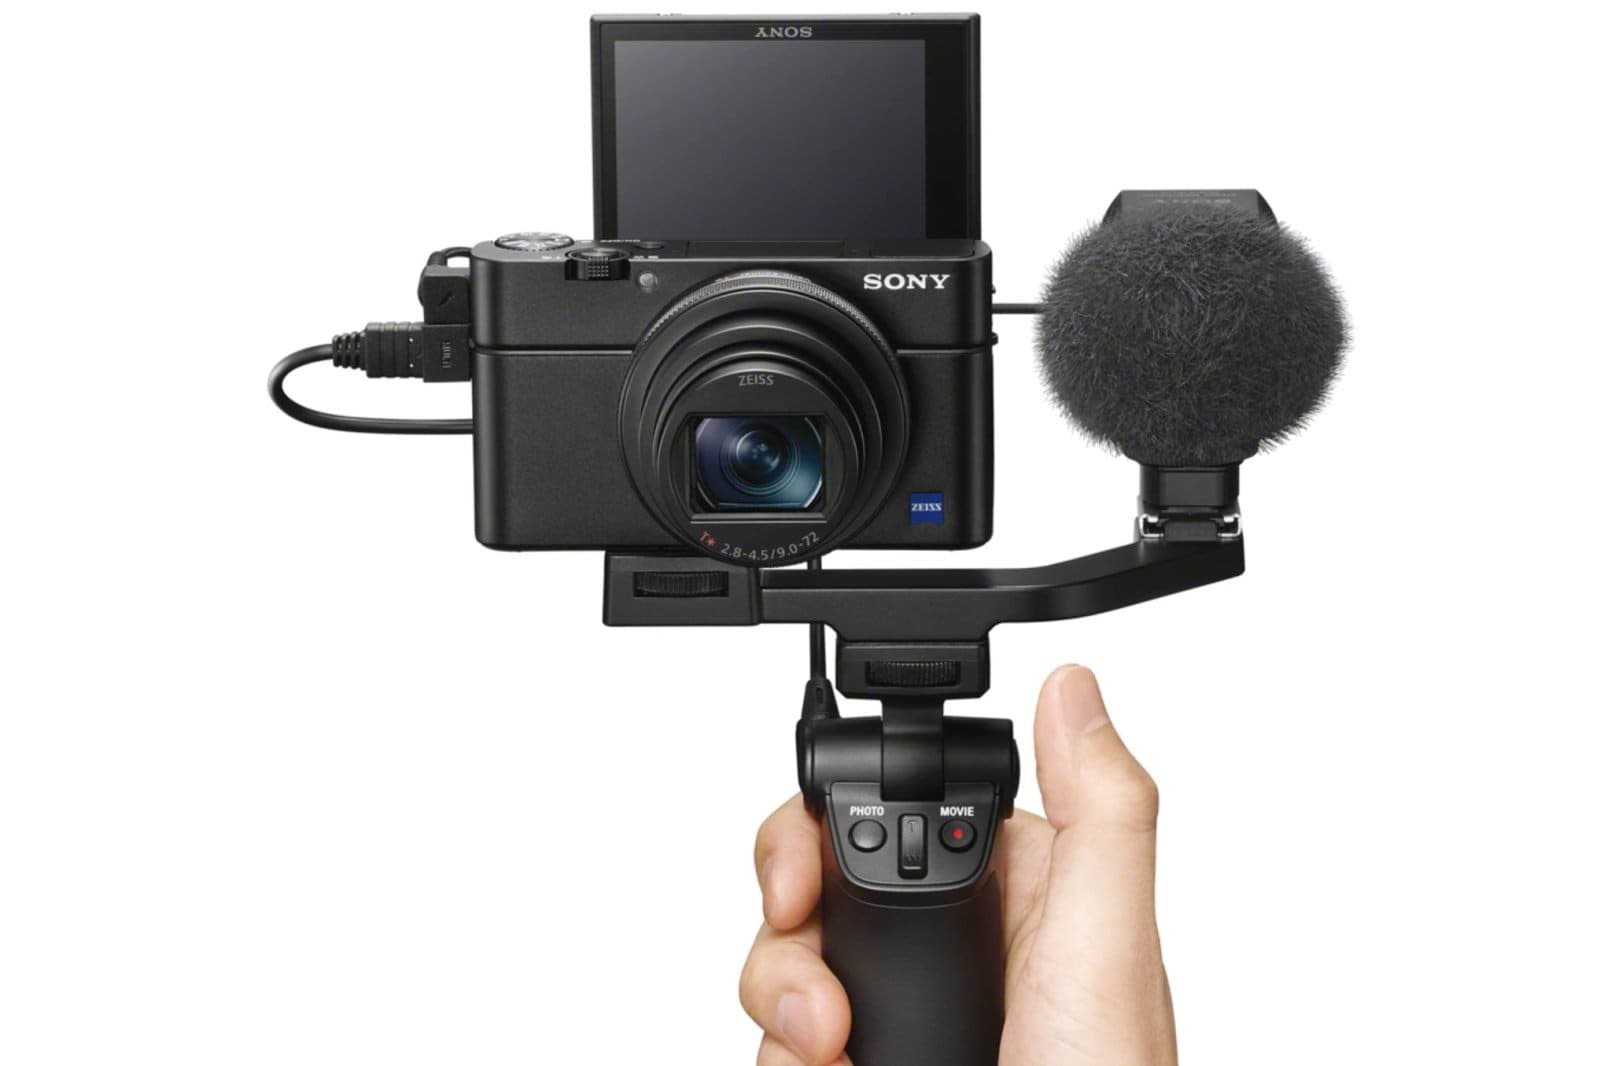 Sony RX100 VII compact camera